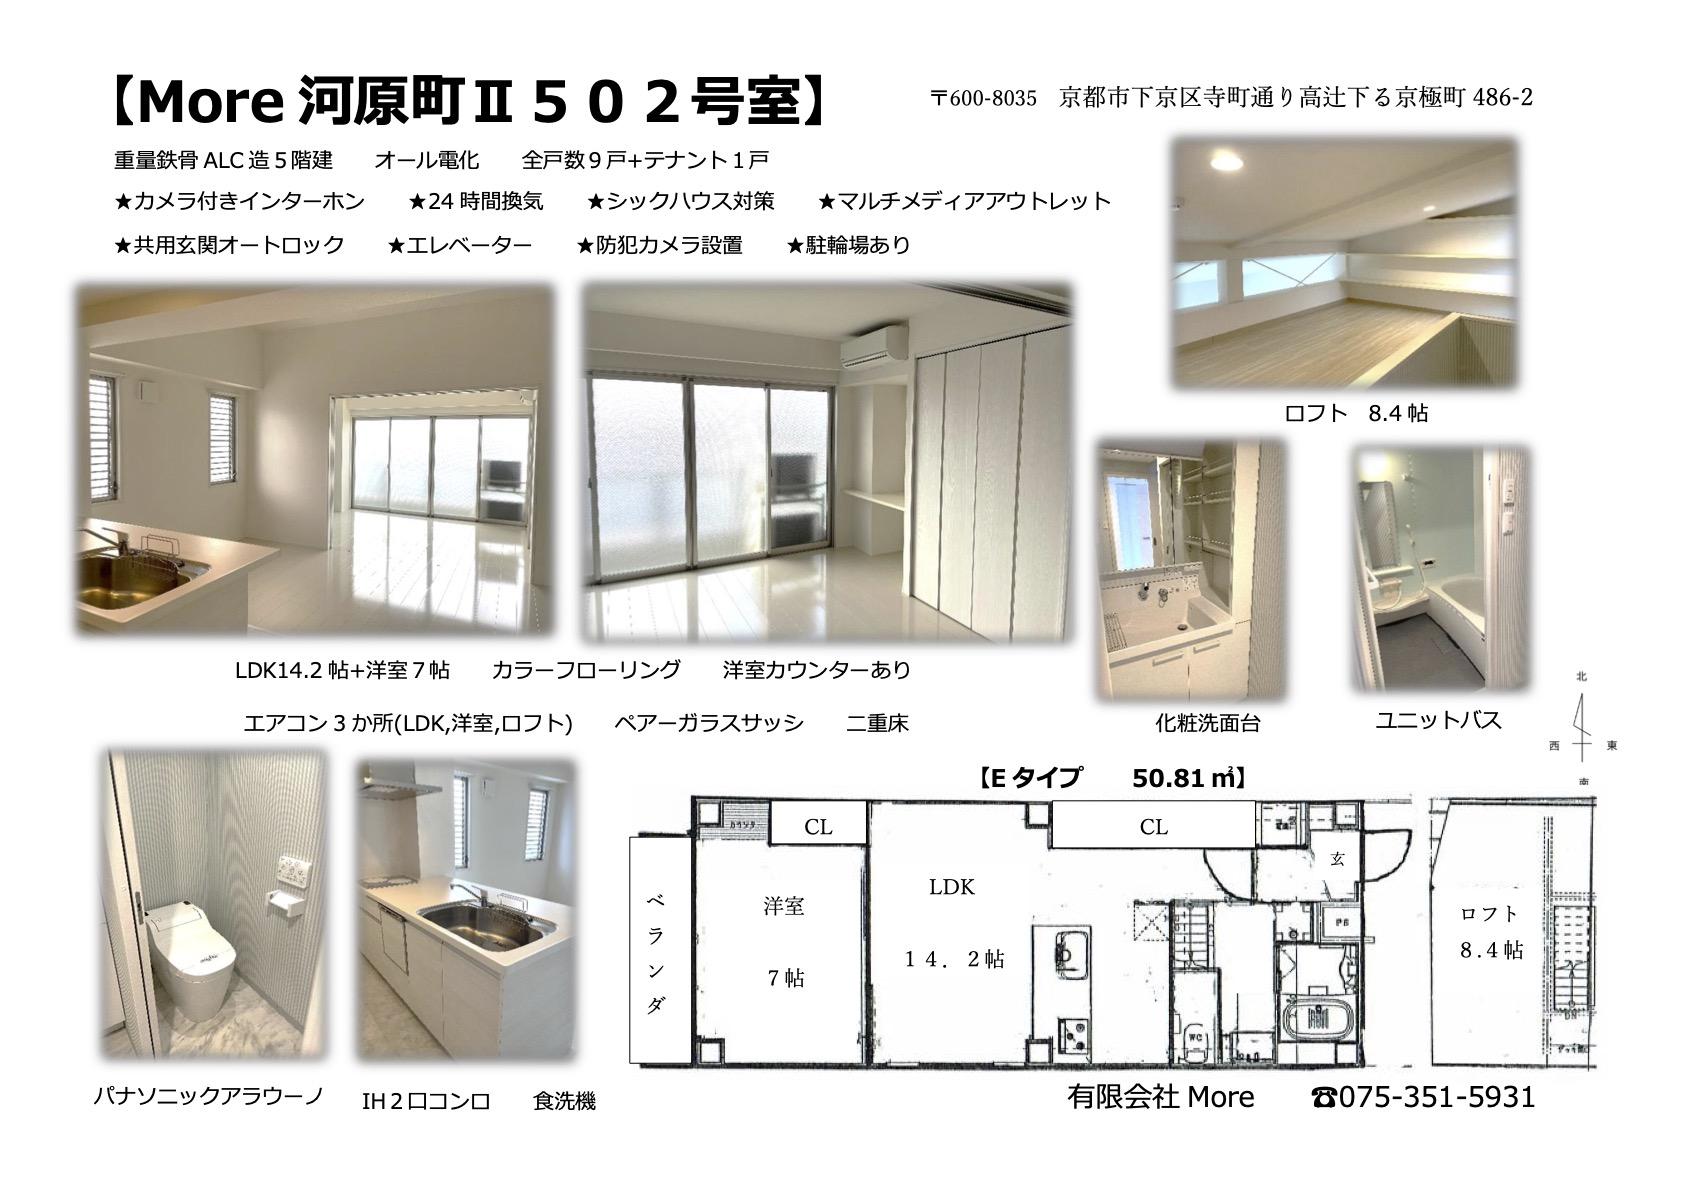 More河原町Ⅱ 502号室